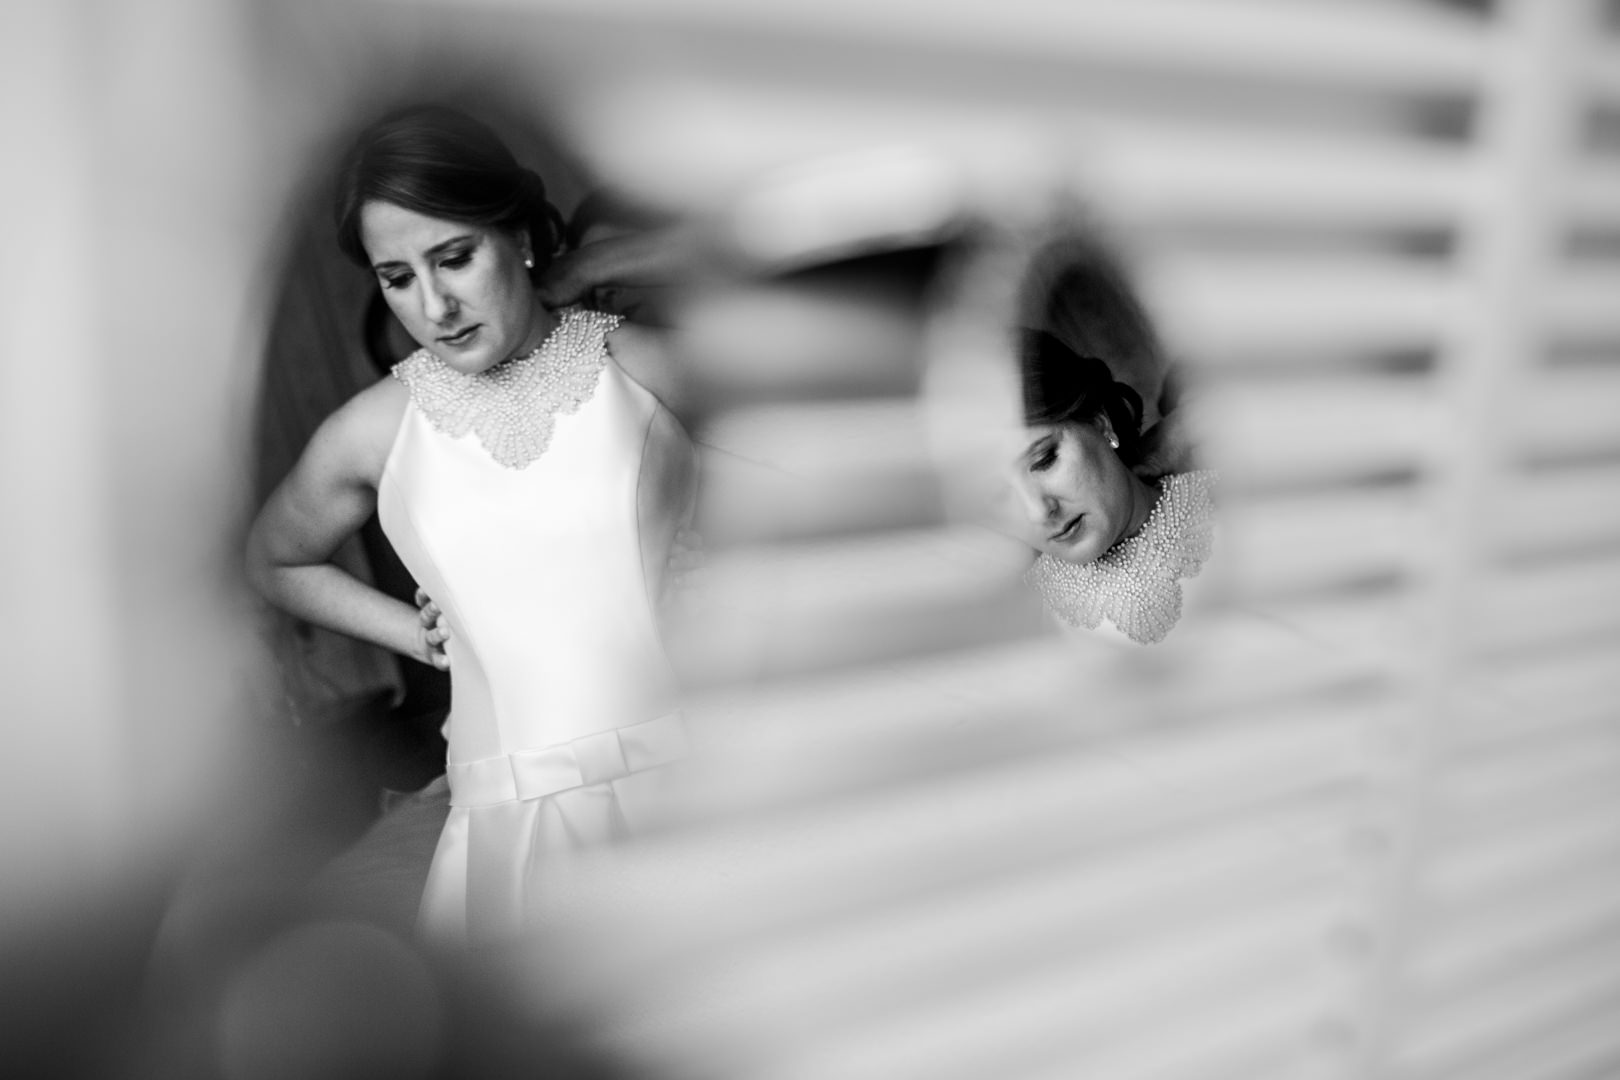 Boda-Catedral-Jaen-Hamburgo-Maria-David-engagement-Rafael-Torres-fotografo-bodas-sevilla-madrid-barcelona-wedding-photographer--14.jpg